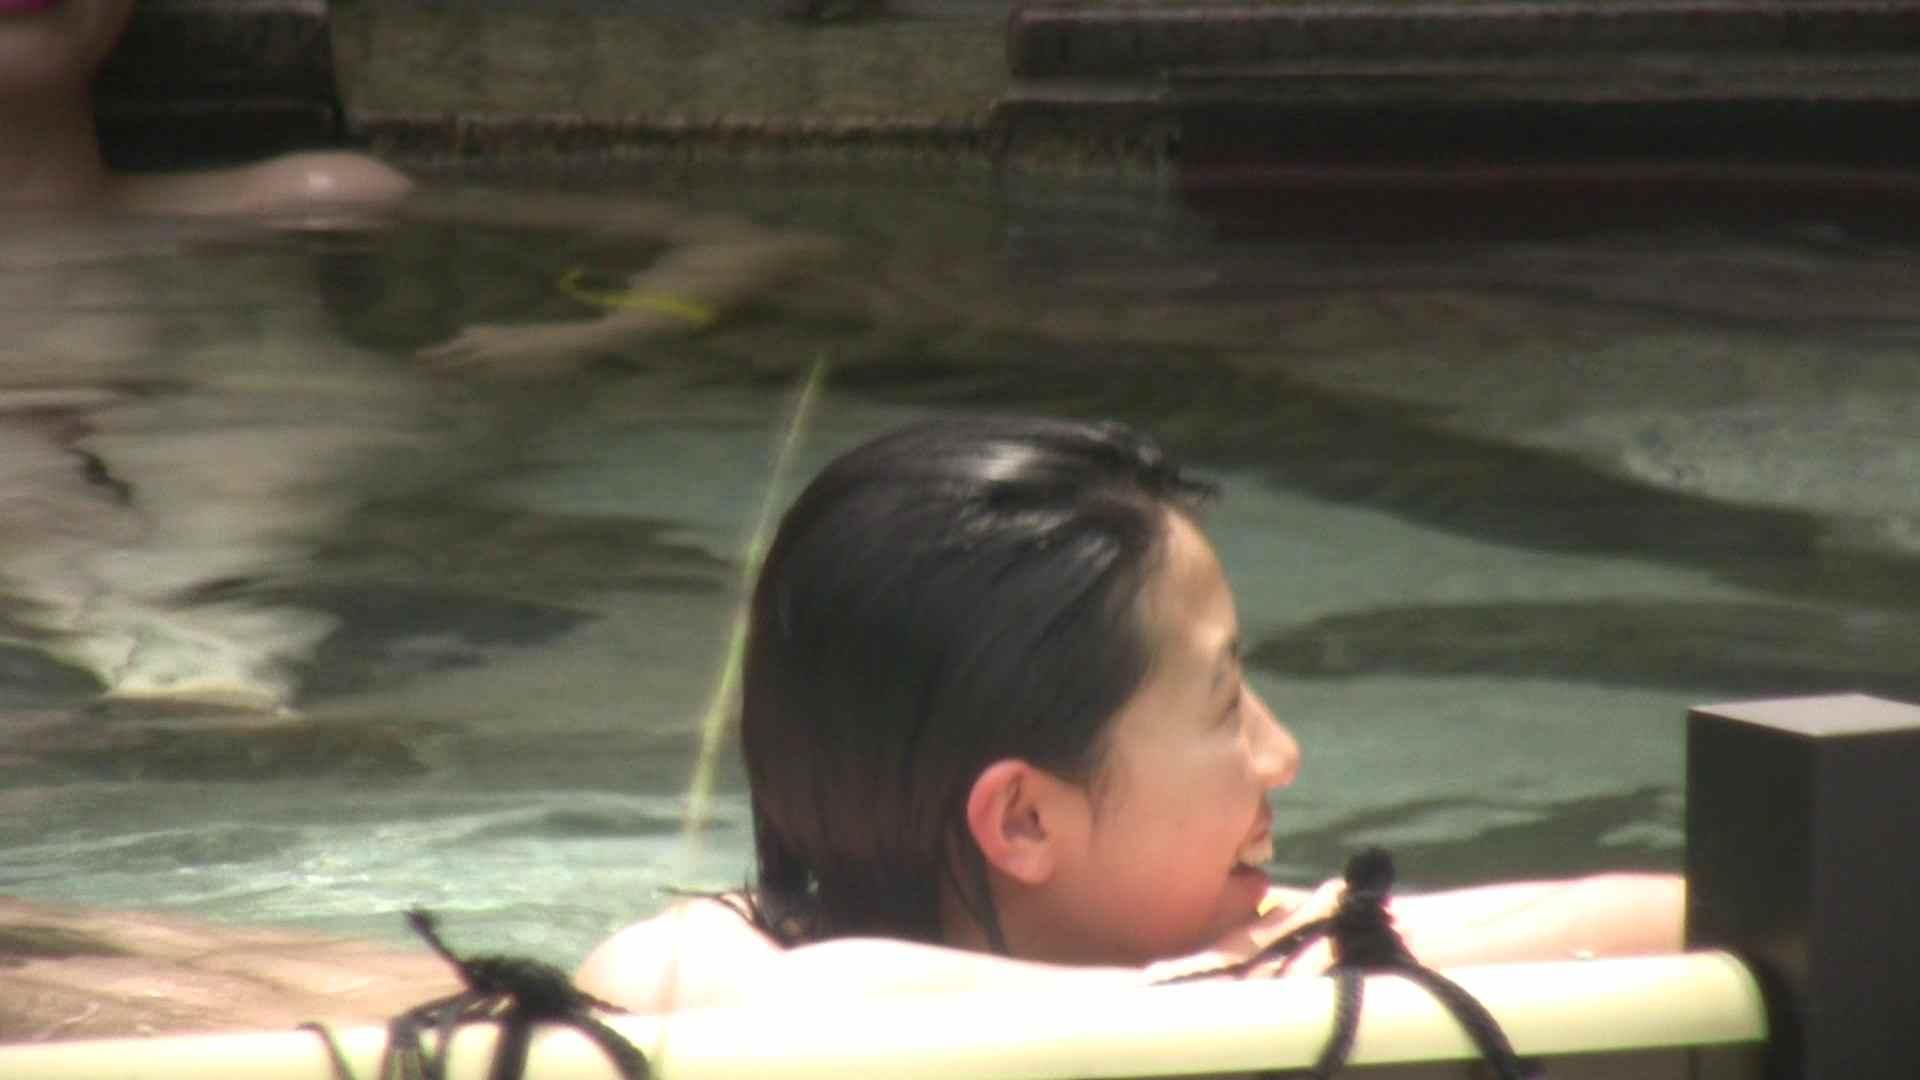 Aquaな露天風呂Vol.124 綺麗なOLたち エロ画像 72枚 23